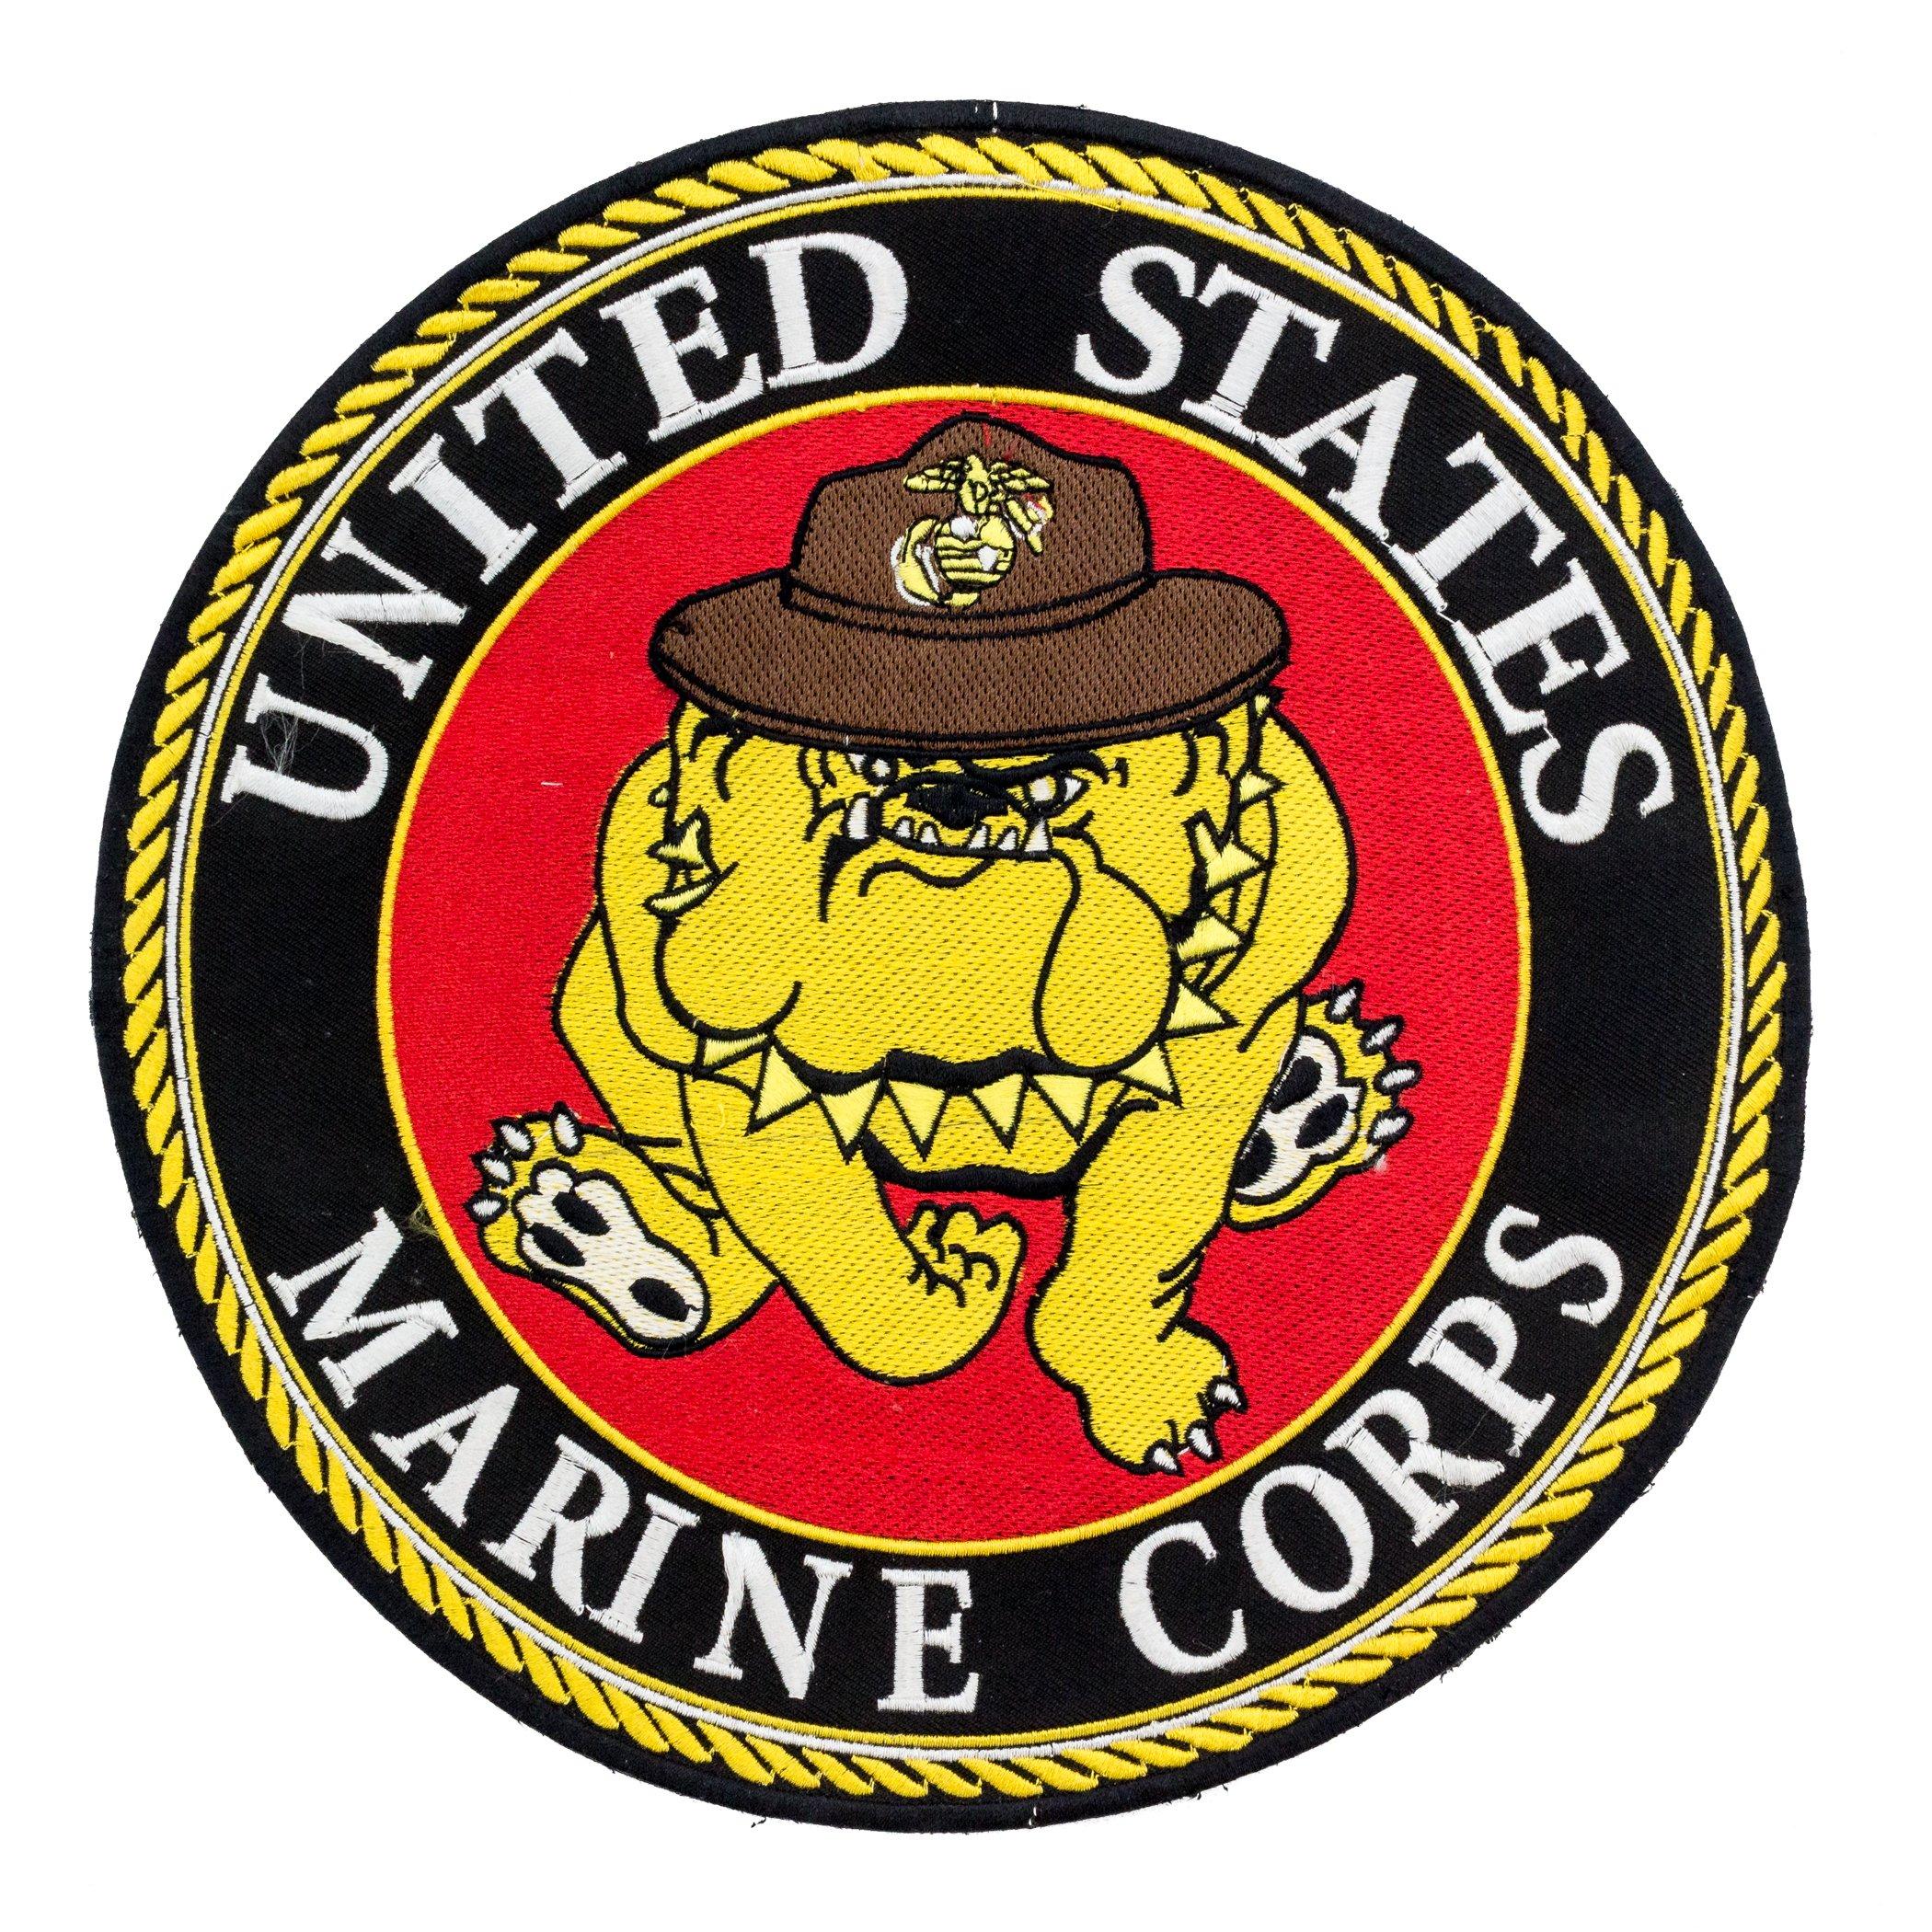 United States Marine Corps Bull Dog In Hat Center Patch For Vest Jacket Marine Corps United States Marine Corps United States Marine